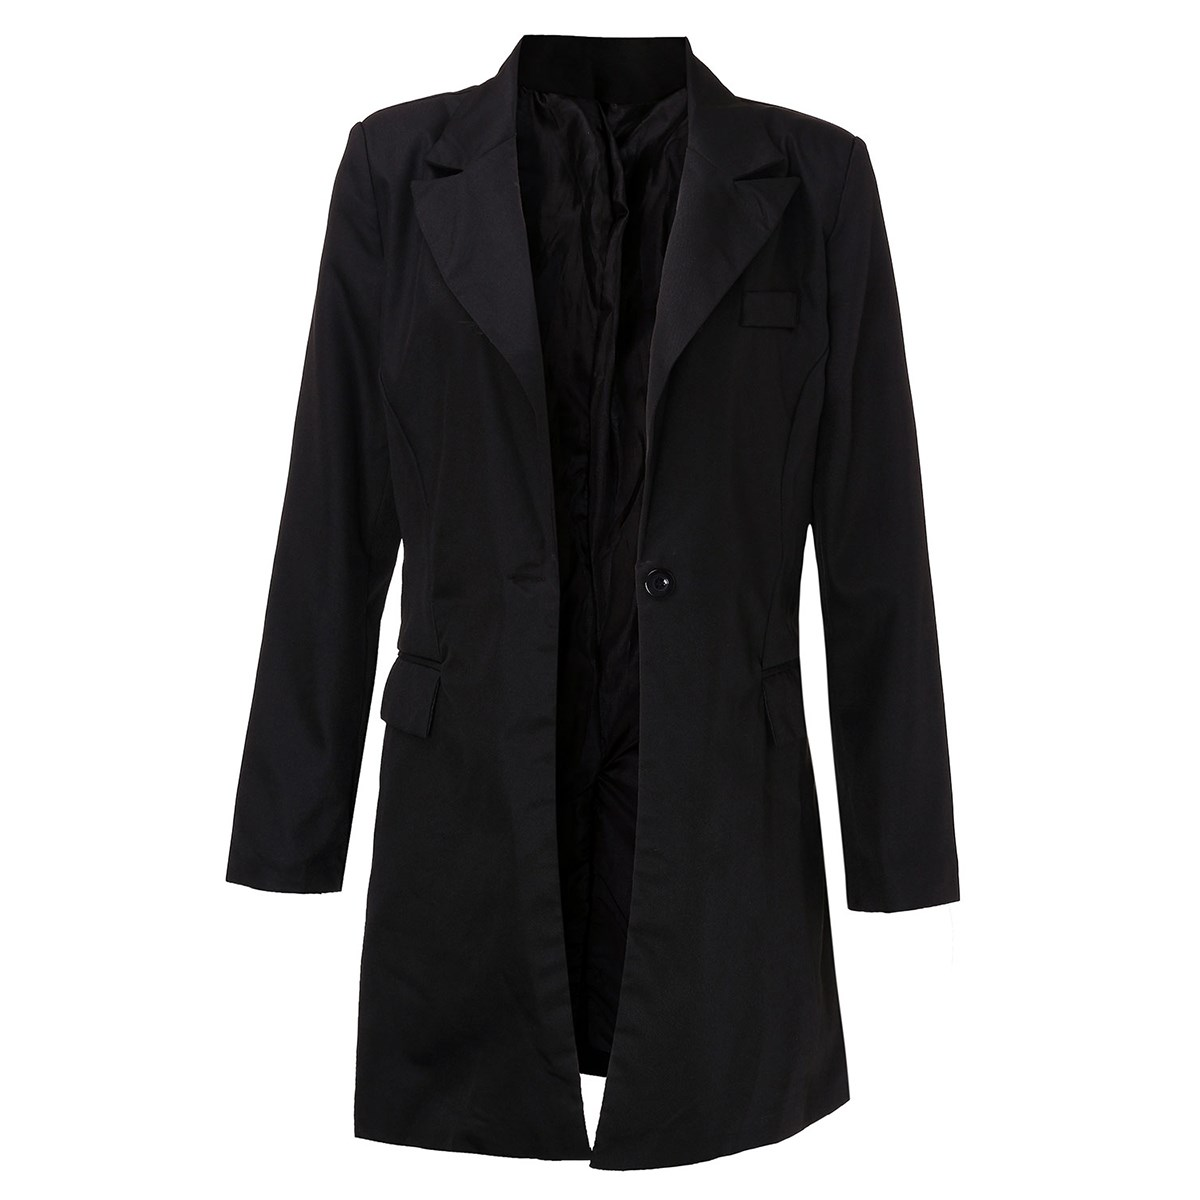 ZANZEA 2019 Womens Spring Blazer Outwear Fashion Long Sleeve Lapel Collar Single Button Elegant Black Long Coat Blazer Feminino